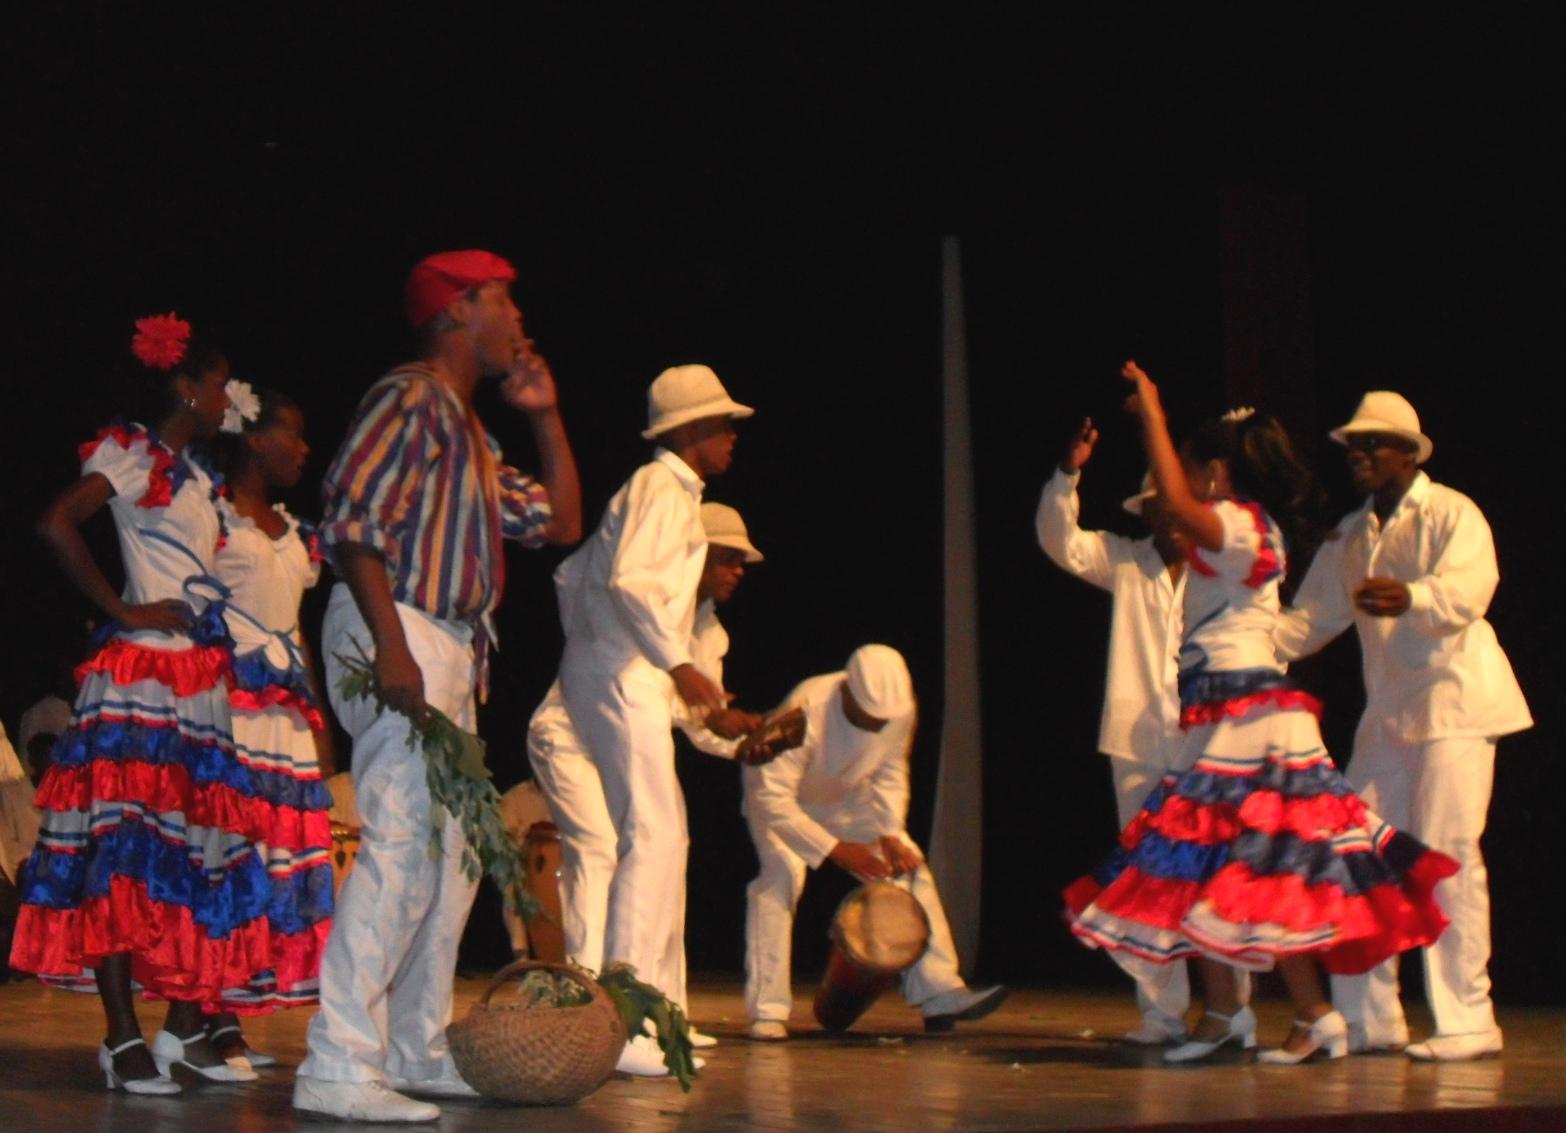 Comenzó en Santiago de Cuba la X Fiesta de la Danza